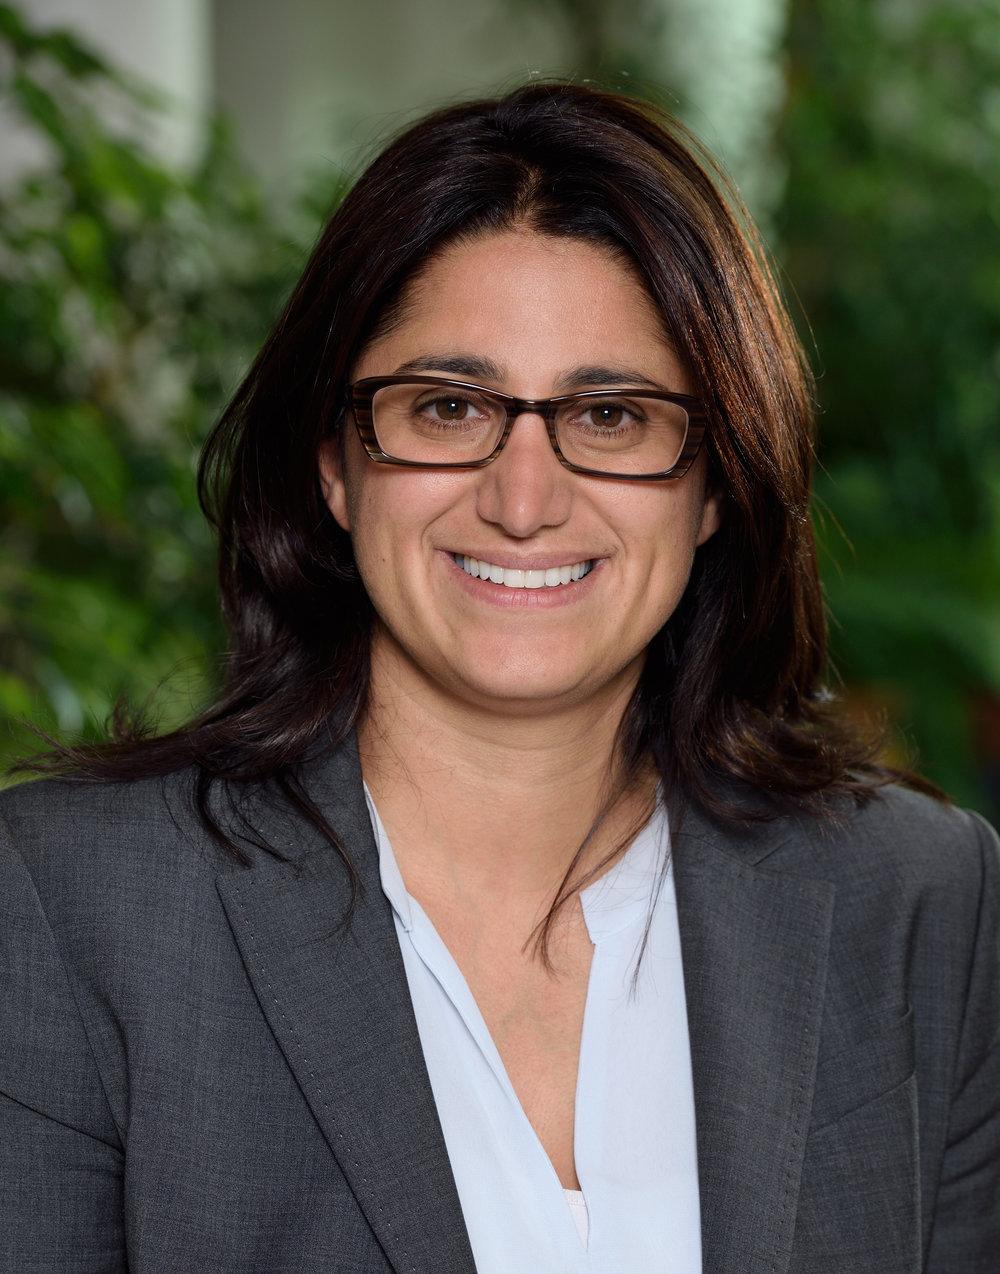 Dr. Mona Hana-Attisha